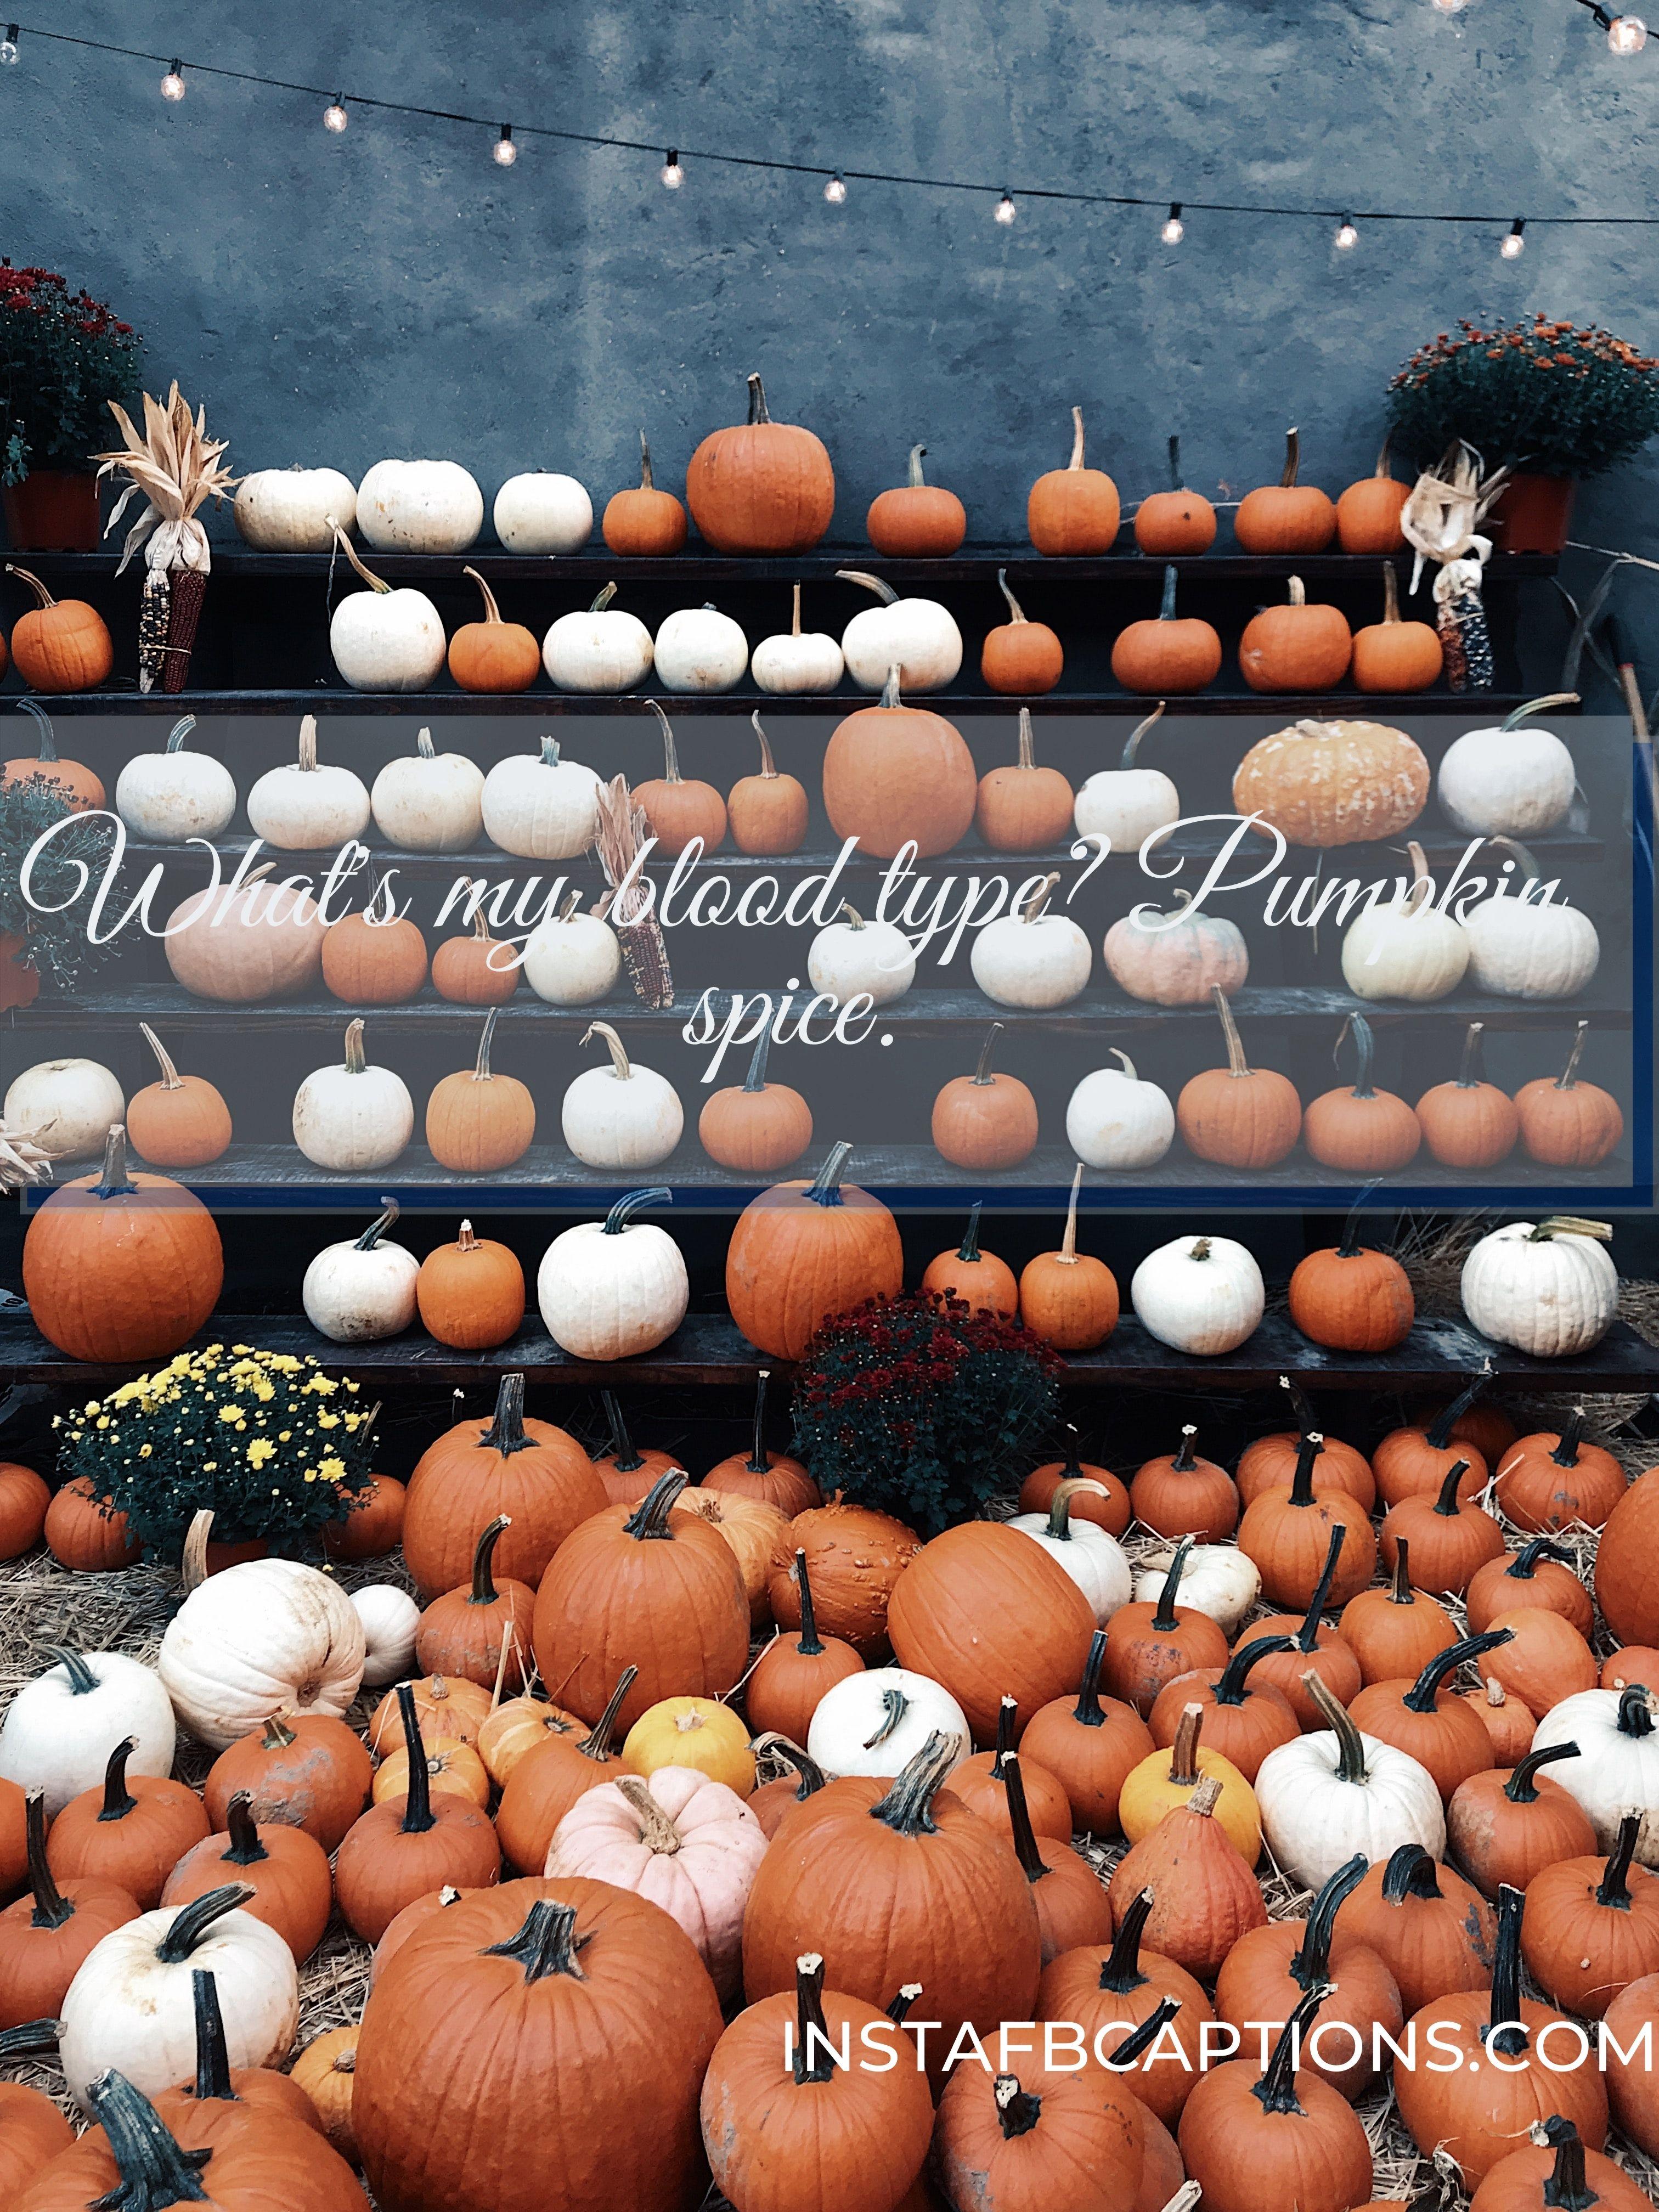 pumpkin instagram captions  - Whats my blood type  Pumpkin spice - Autumn Fall Season Captions || (Leaf Pumpkin Selfie)